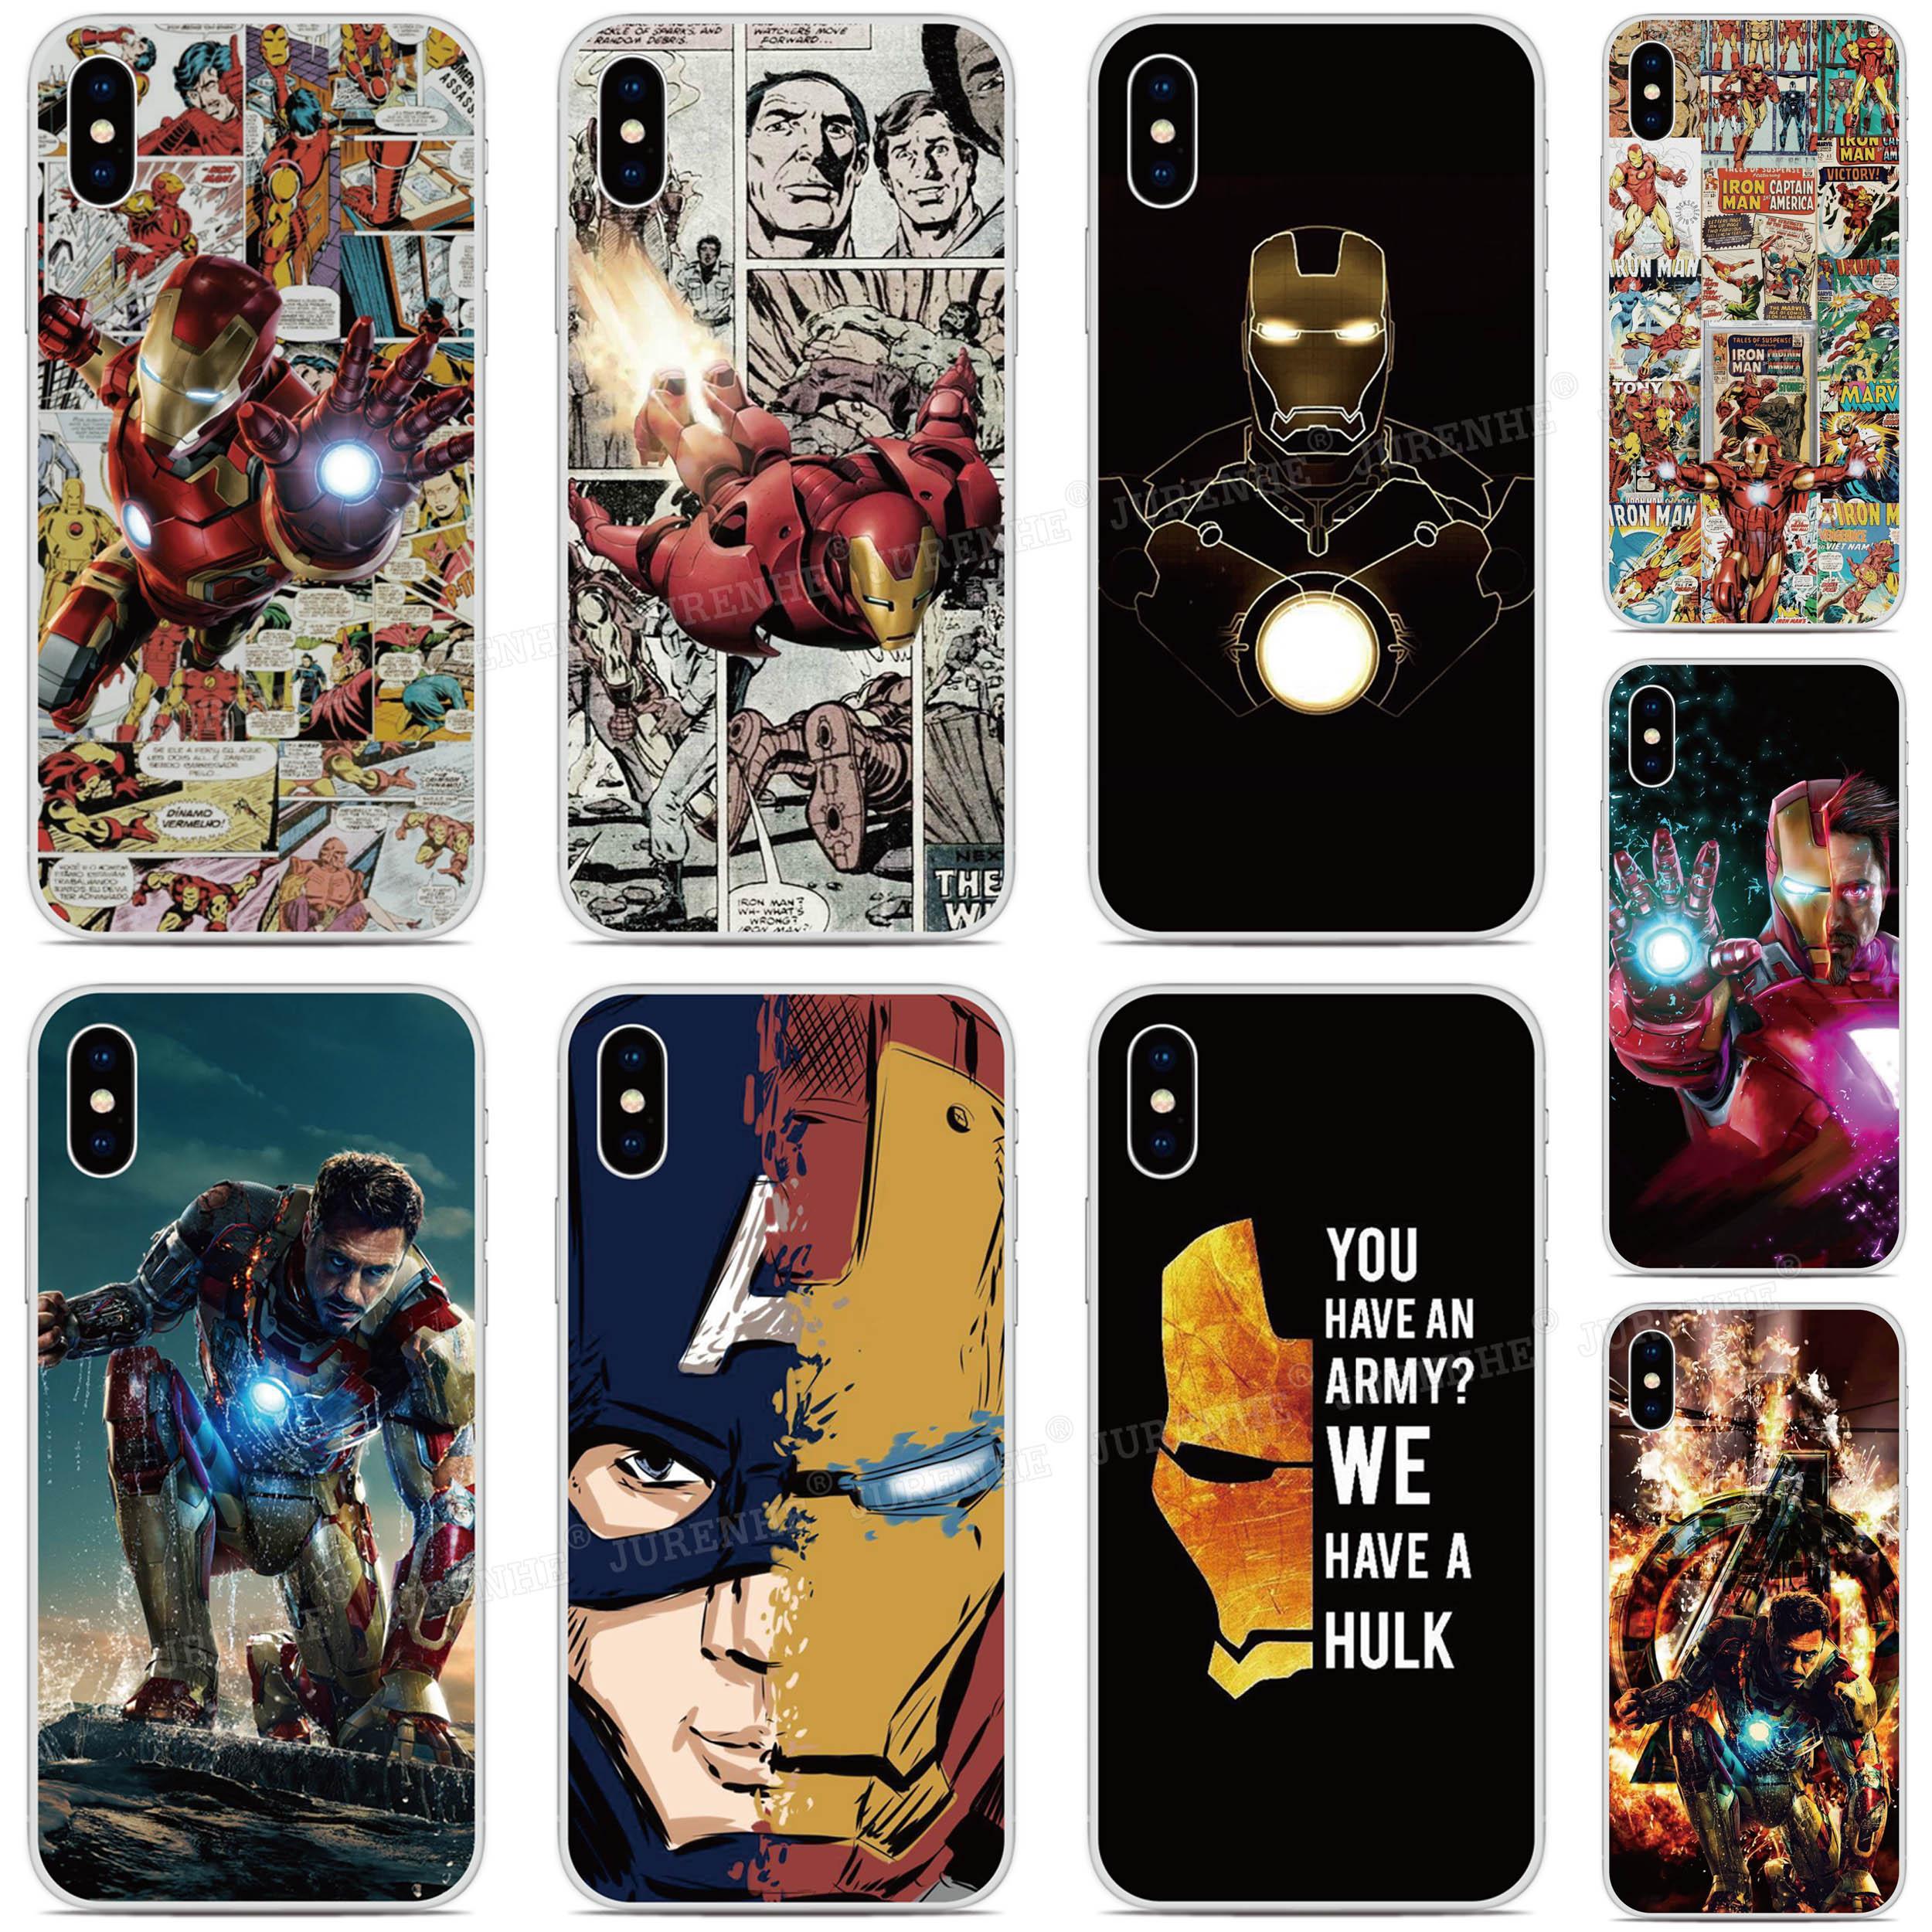 Iron Man Hero TPU Phone Case For Sony Xperia XZ5 5 XZ3 XZ2 XZ4 Compact ACE XA3 XA1 Plus XA2 Ultra L4 L3 L2 20 8 10 1 II Cover